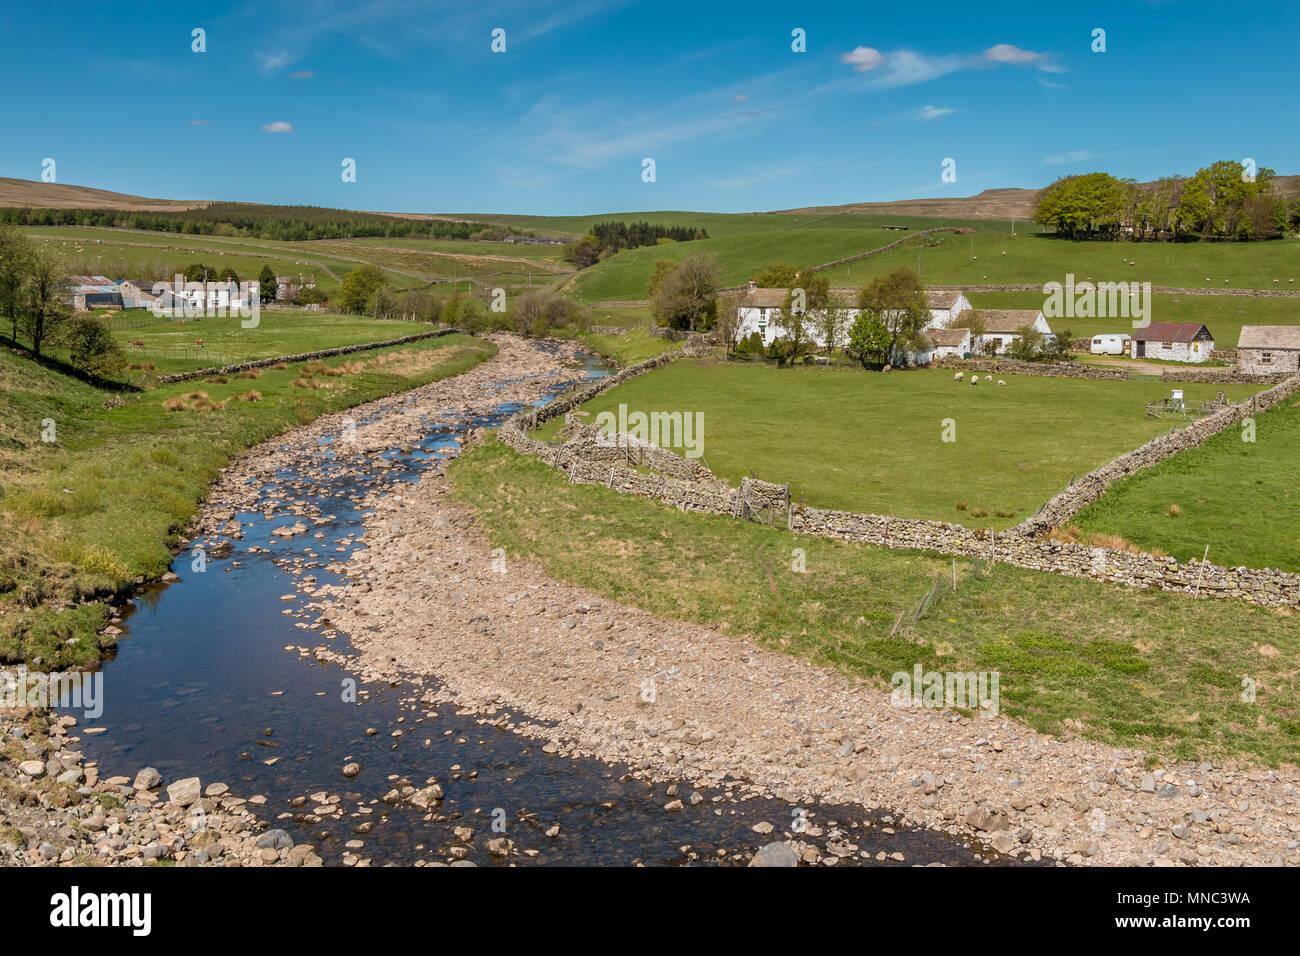 North Pennines landscape, whitewashed farms and Harwood Beck near Langdon Beck, Upper Teesdale, UK - Stock Image